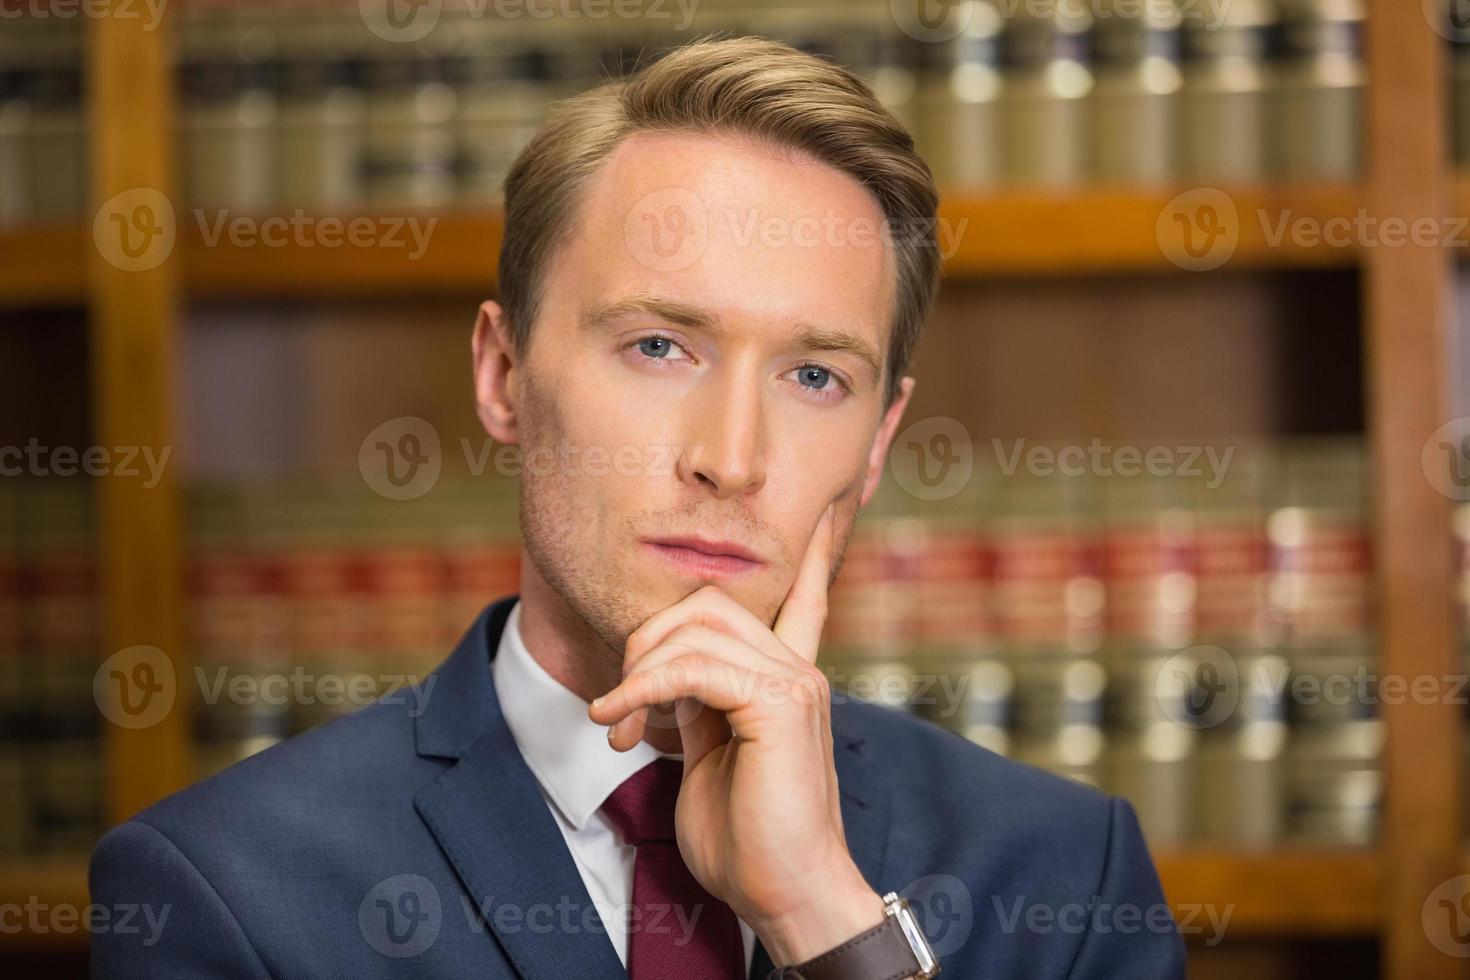 knappe advocaat in de bibliotheek foto